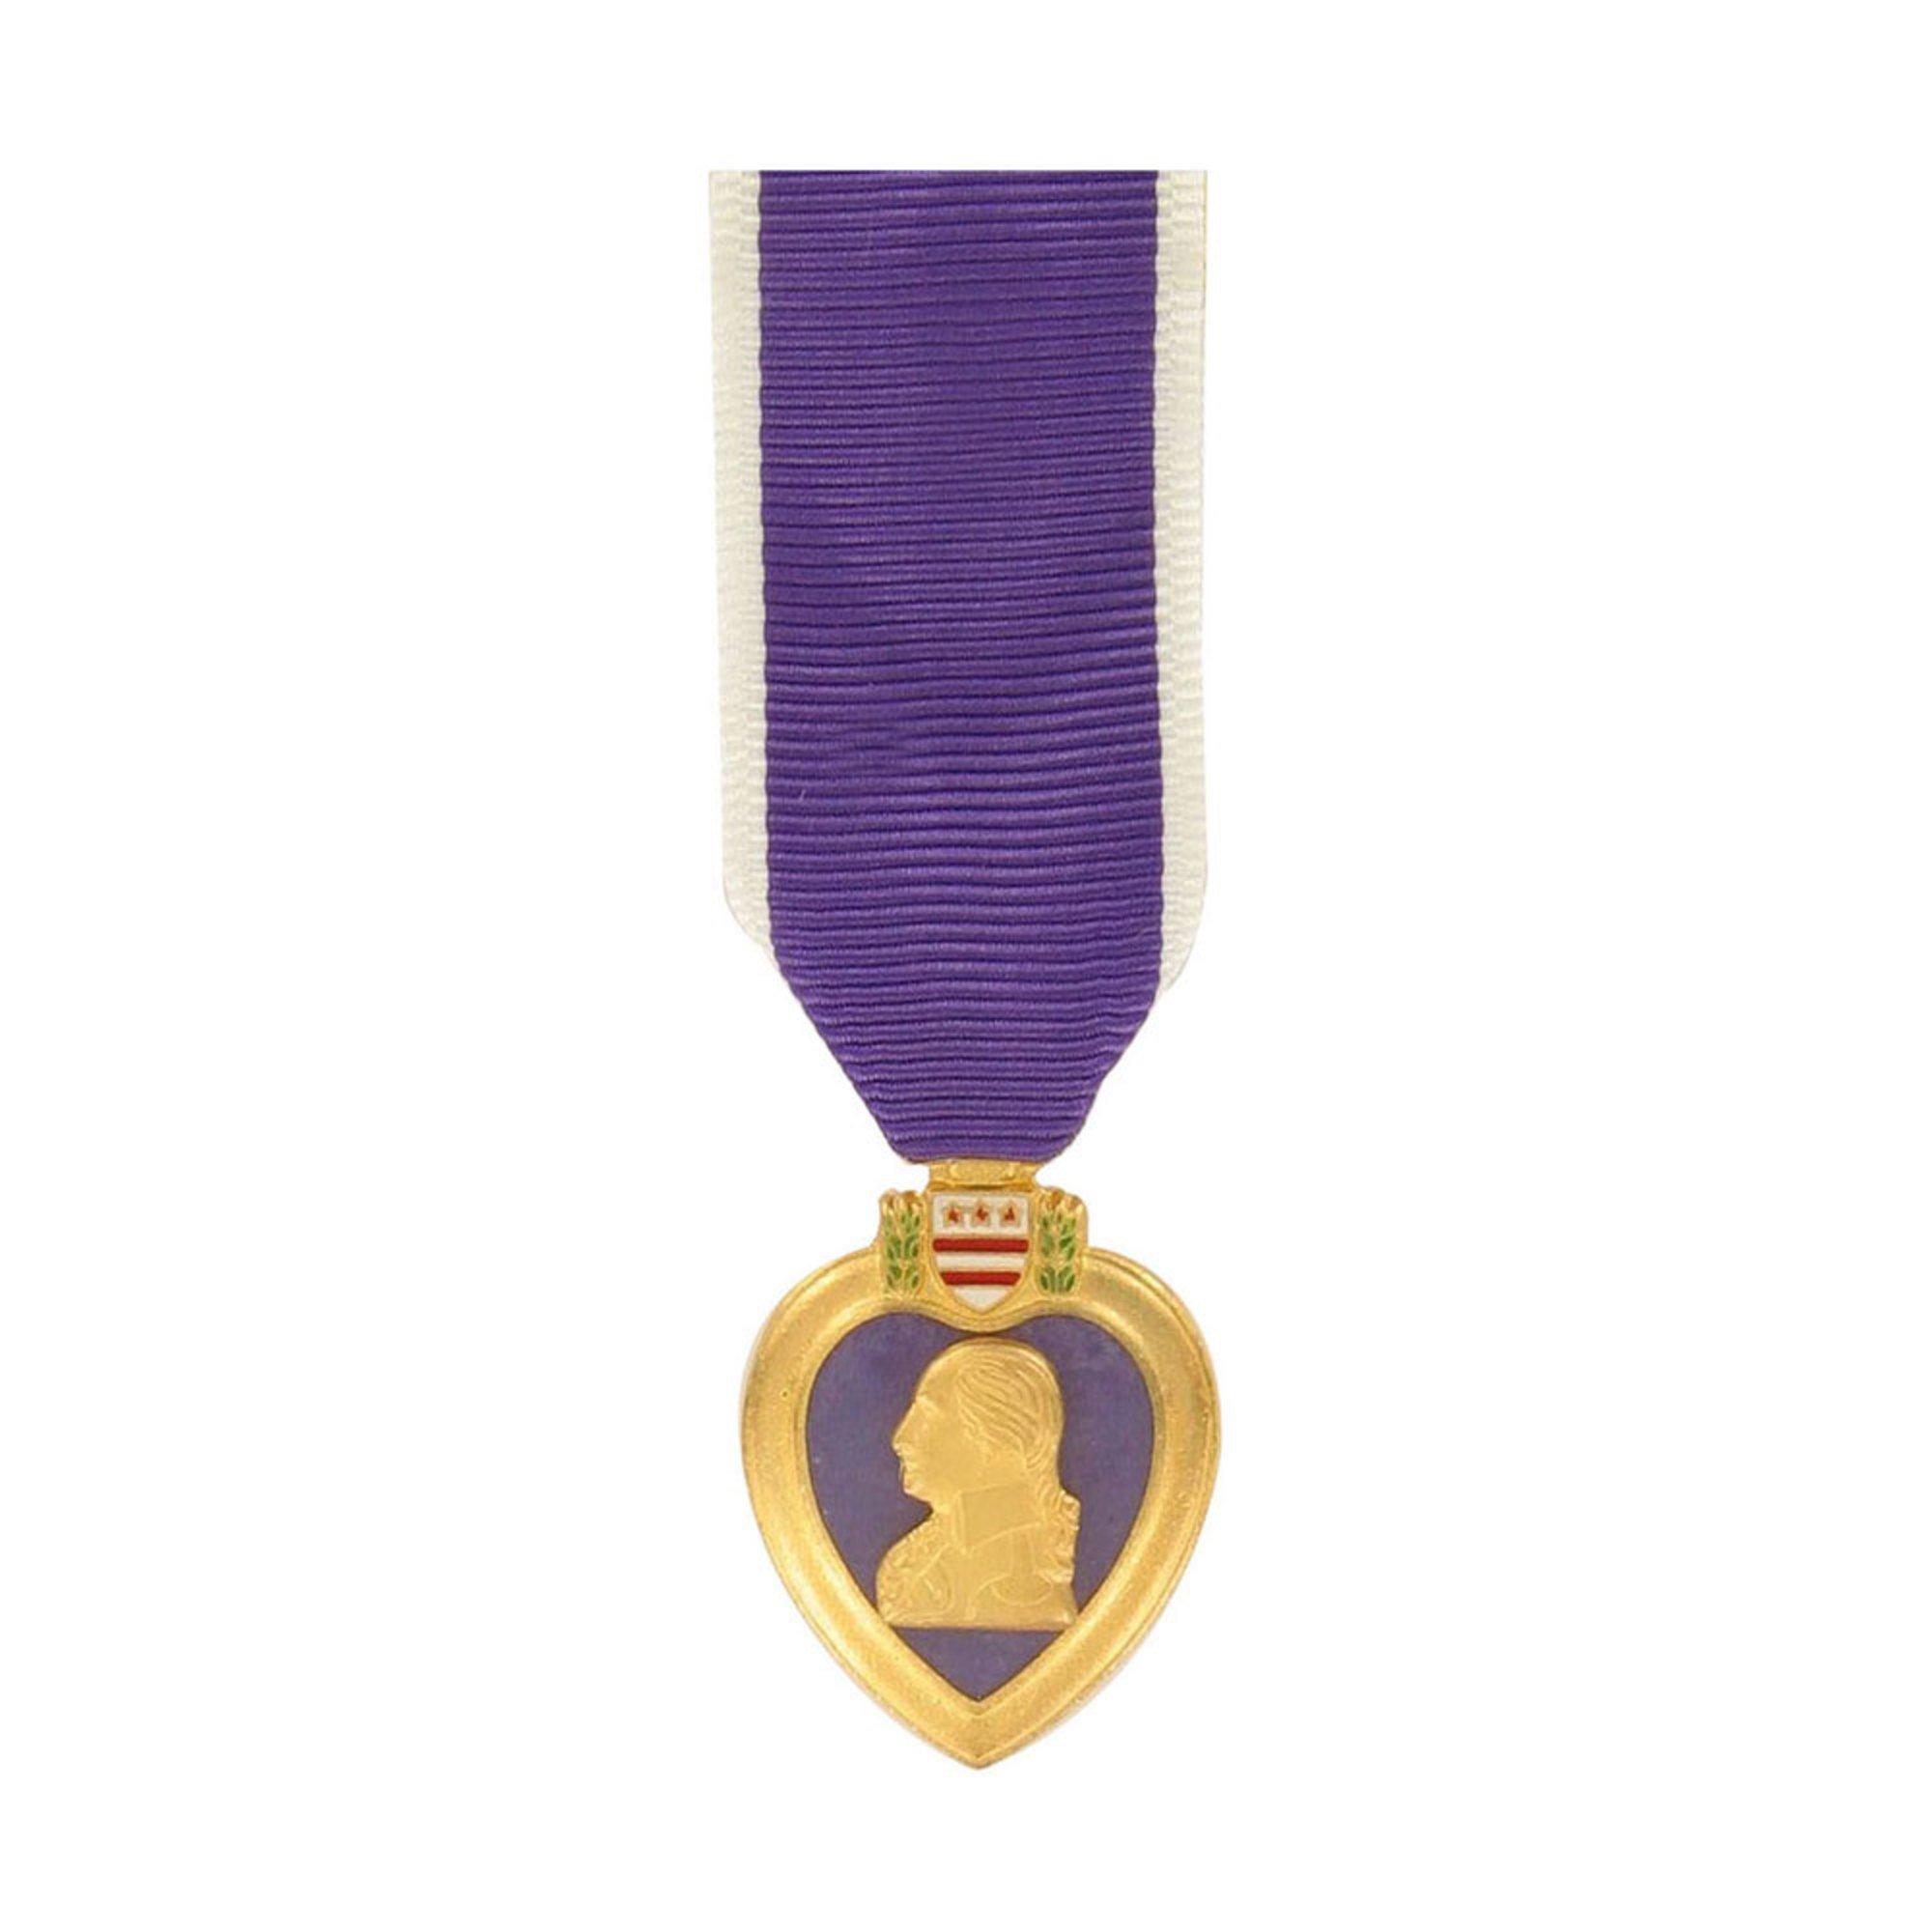 Medal Miniature Purple Heart | Miniature Medals | Military - Shop